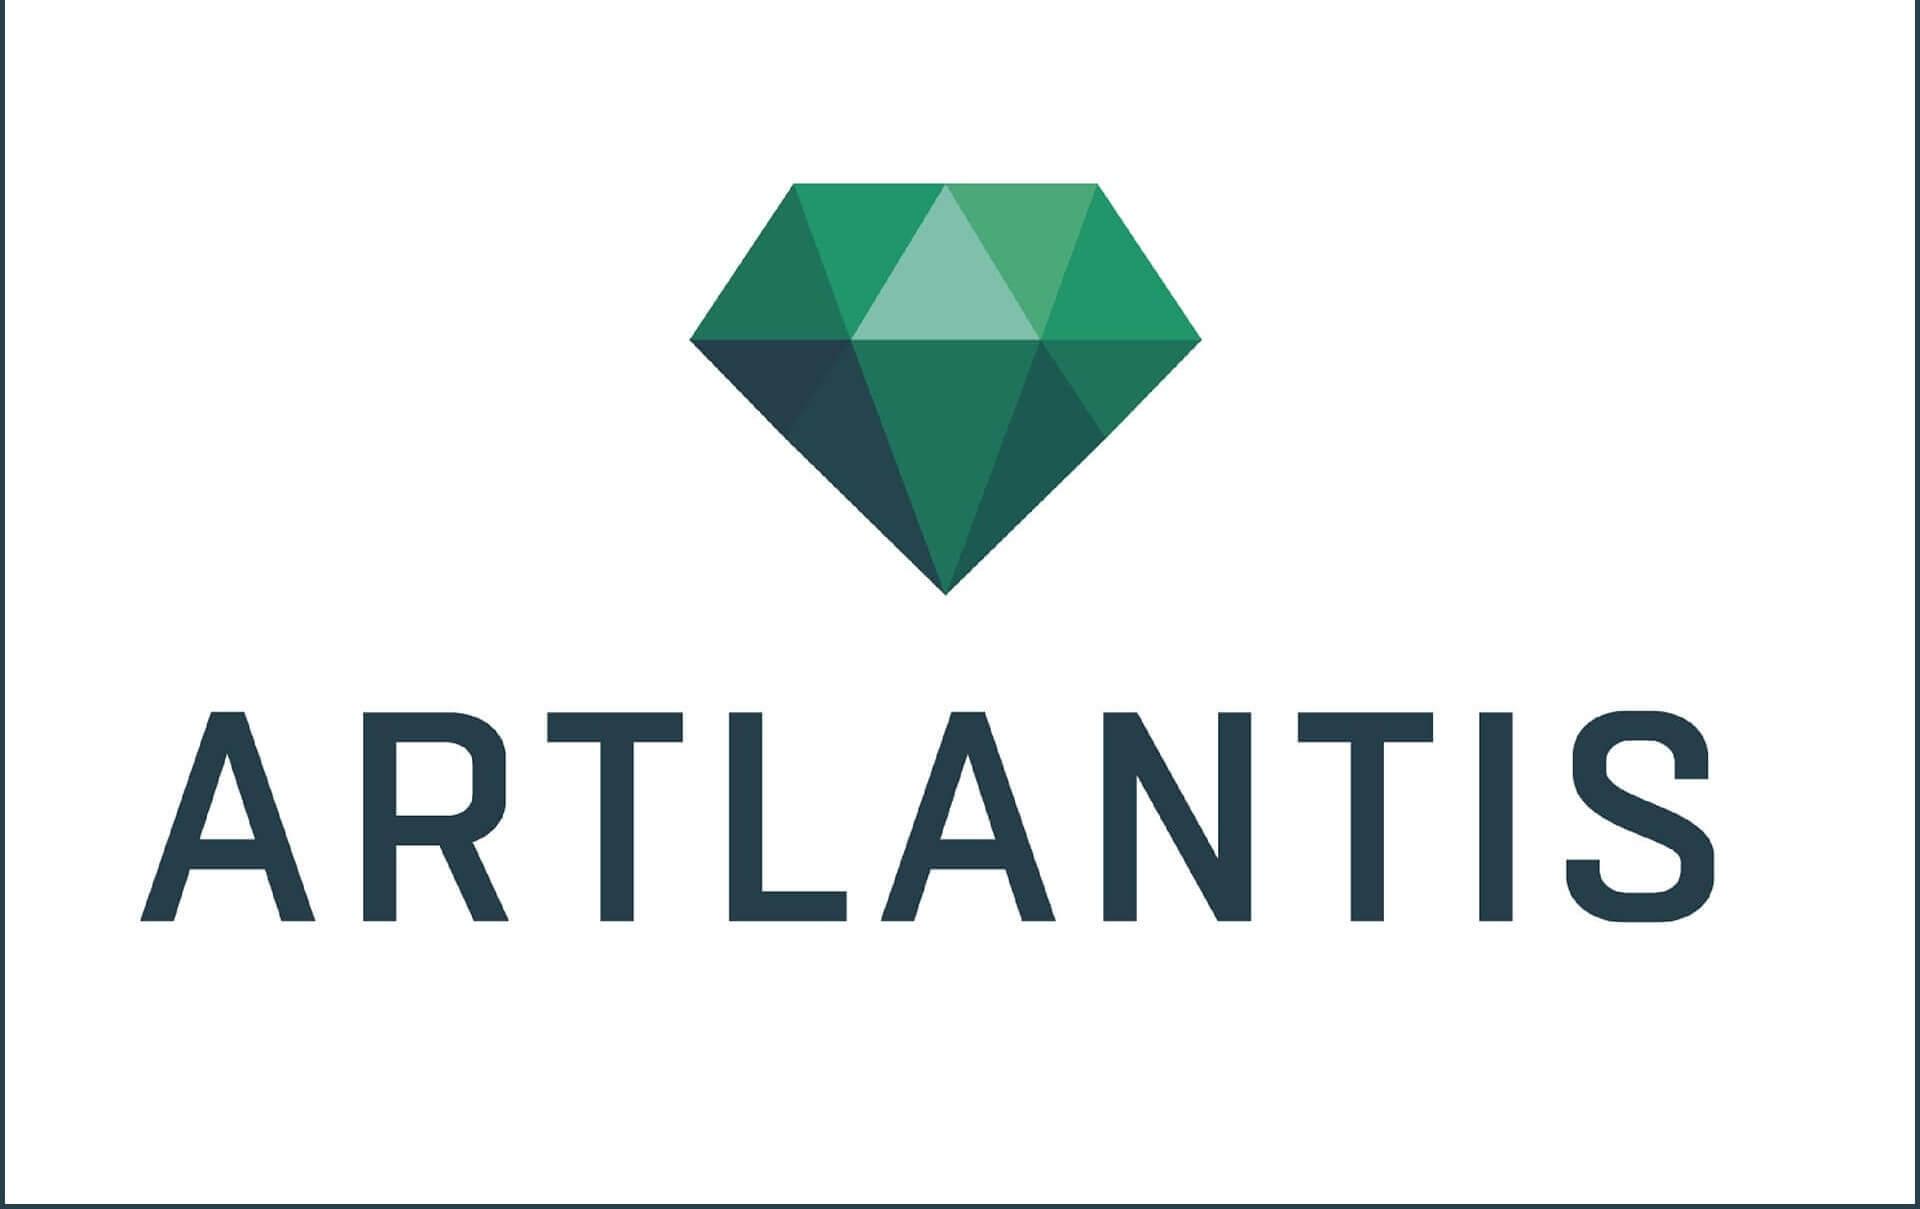 Artlantis 9.5.2.26606 Crack 2021 Free Download Serial Key Latest Version